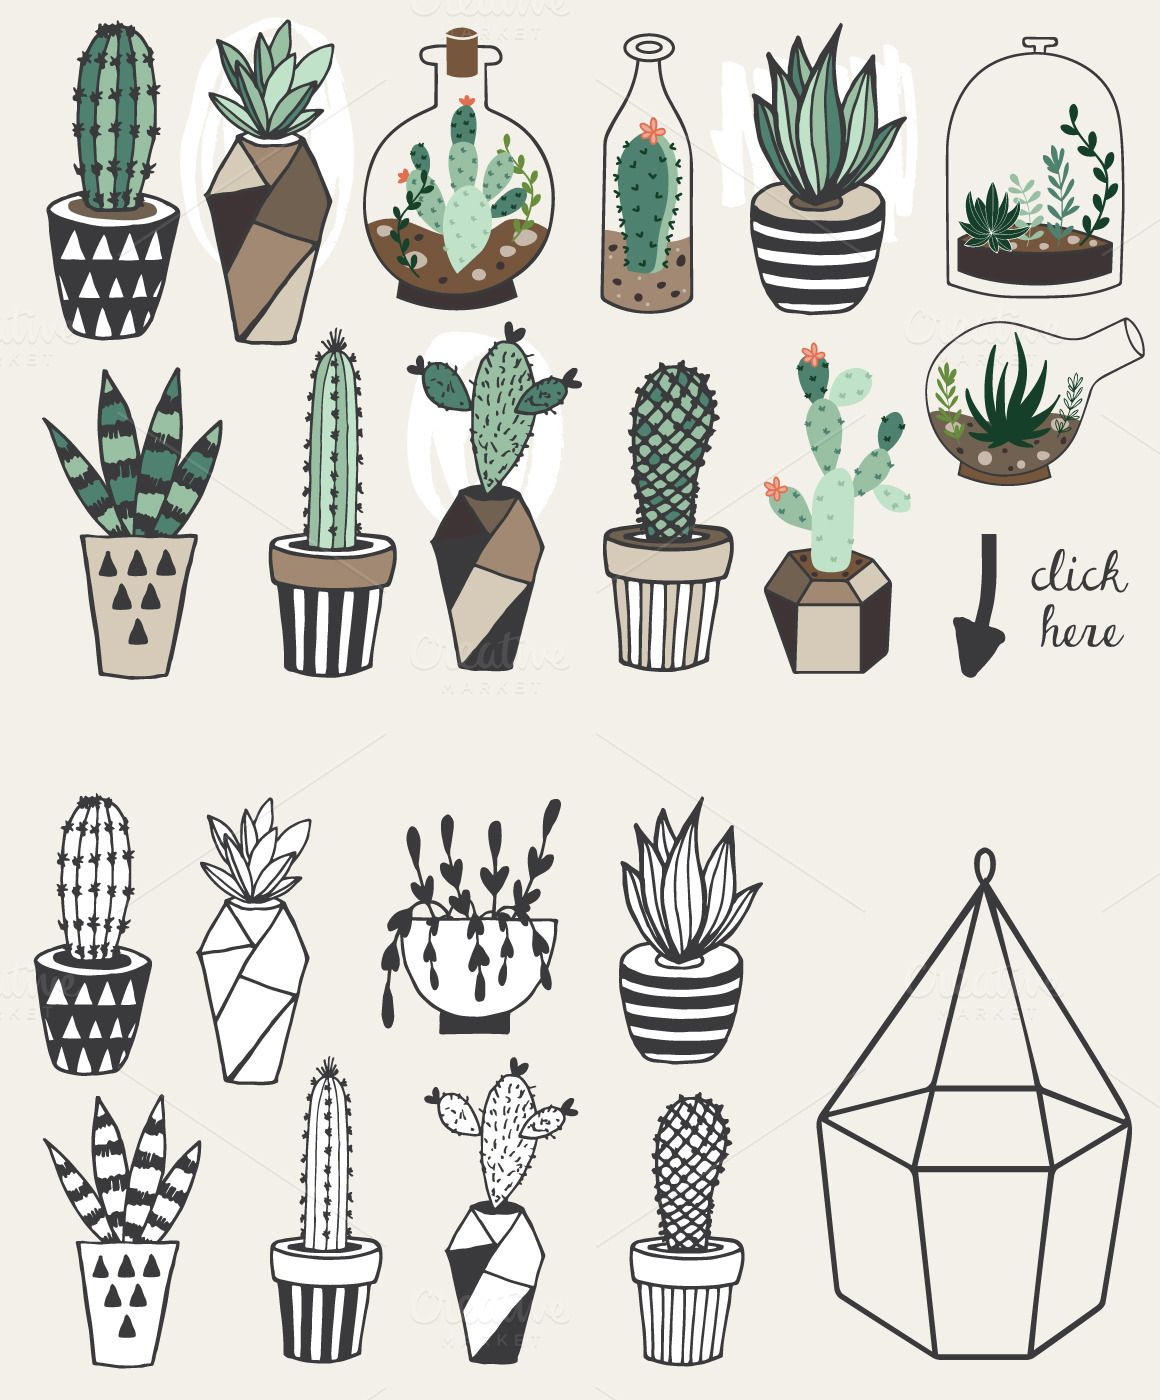 1160x1400 Succulents +unlimited License Artsy Doodles